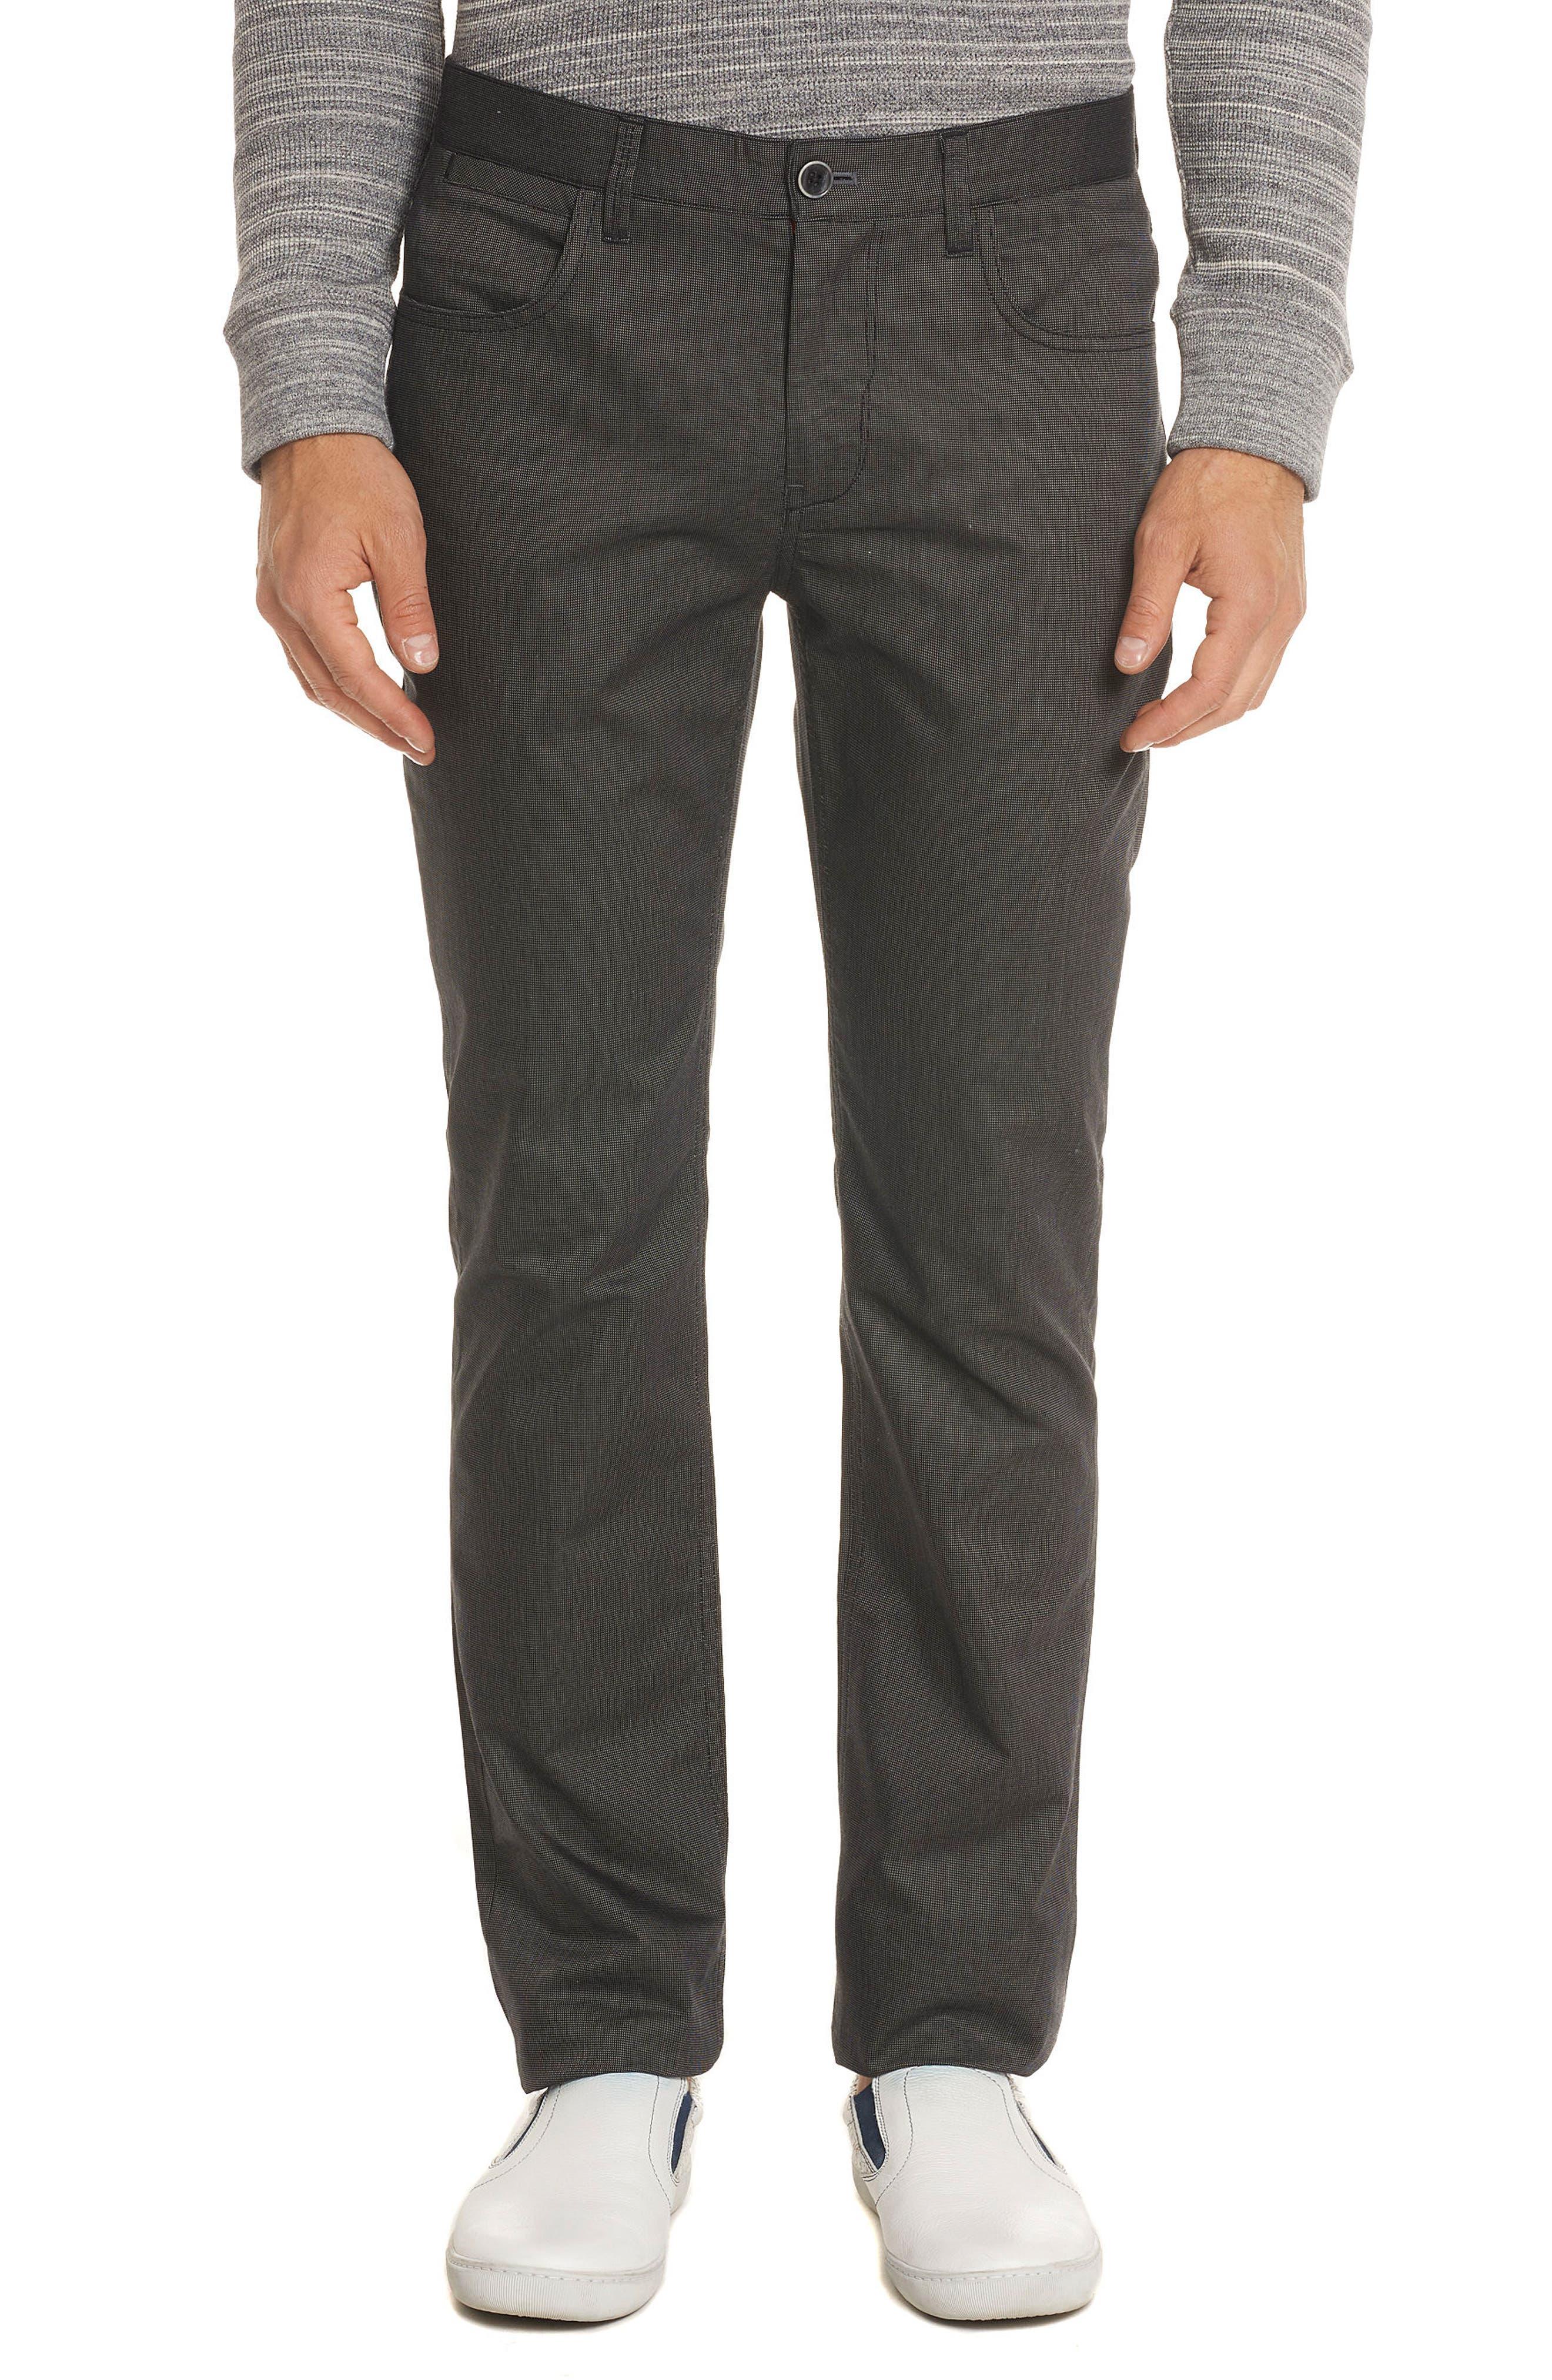 Alternate Image 1 Selected - Robert Graham Prio Tailored Fit Pants